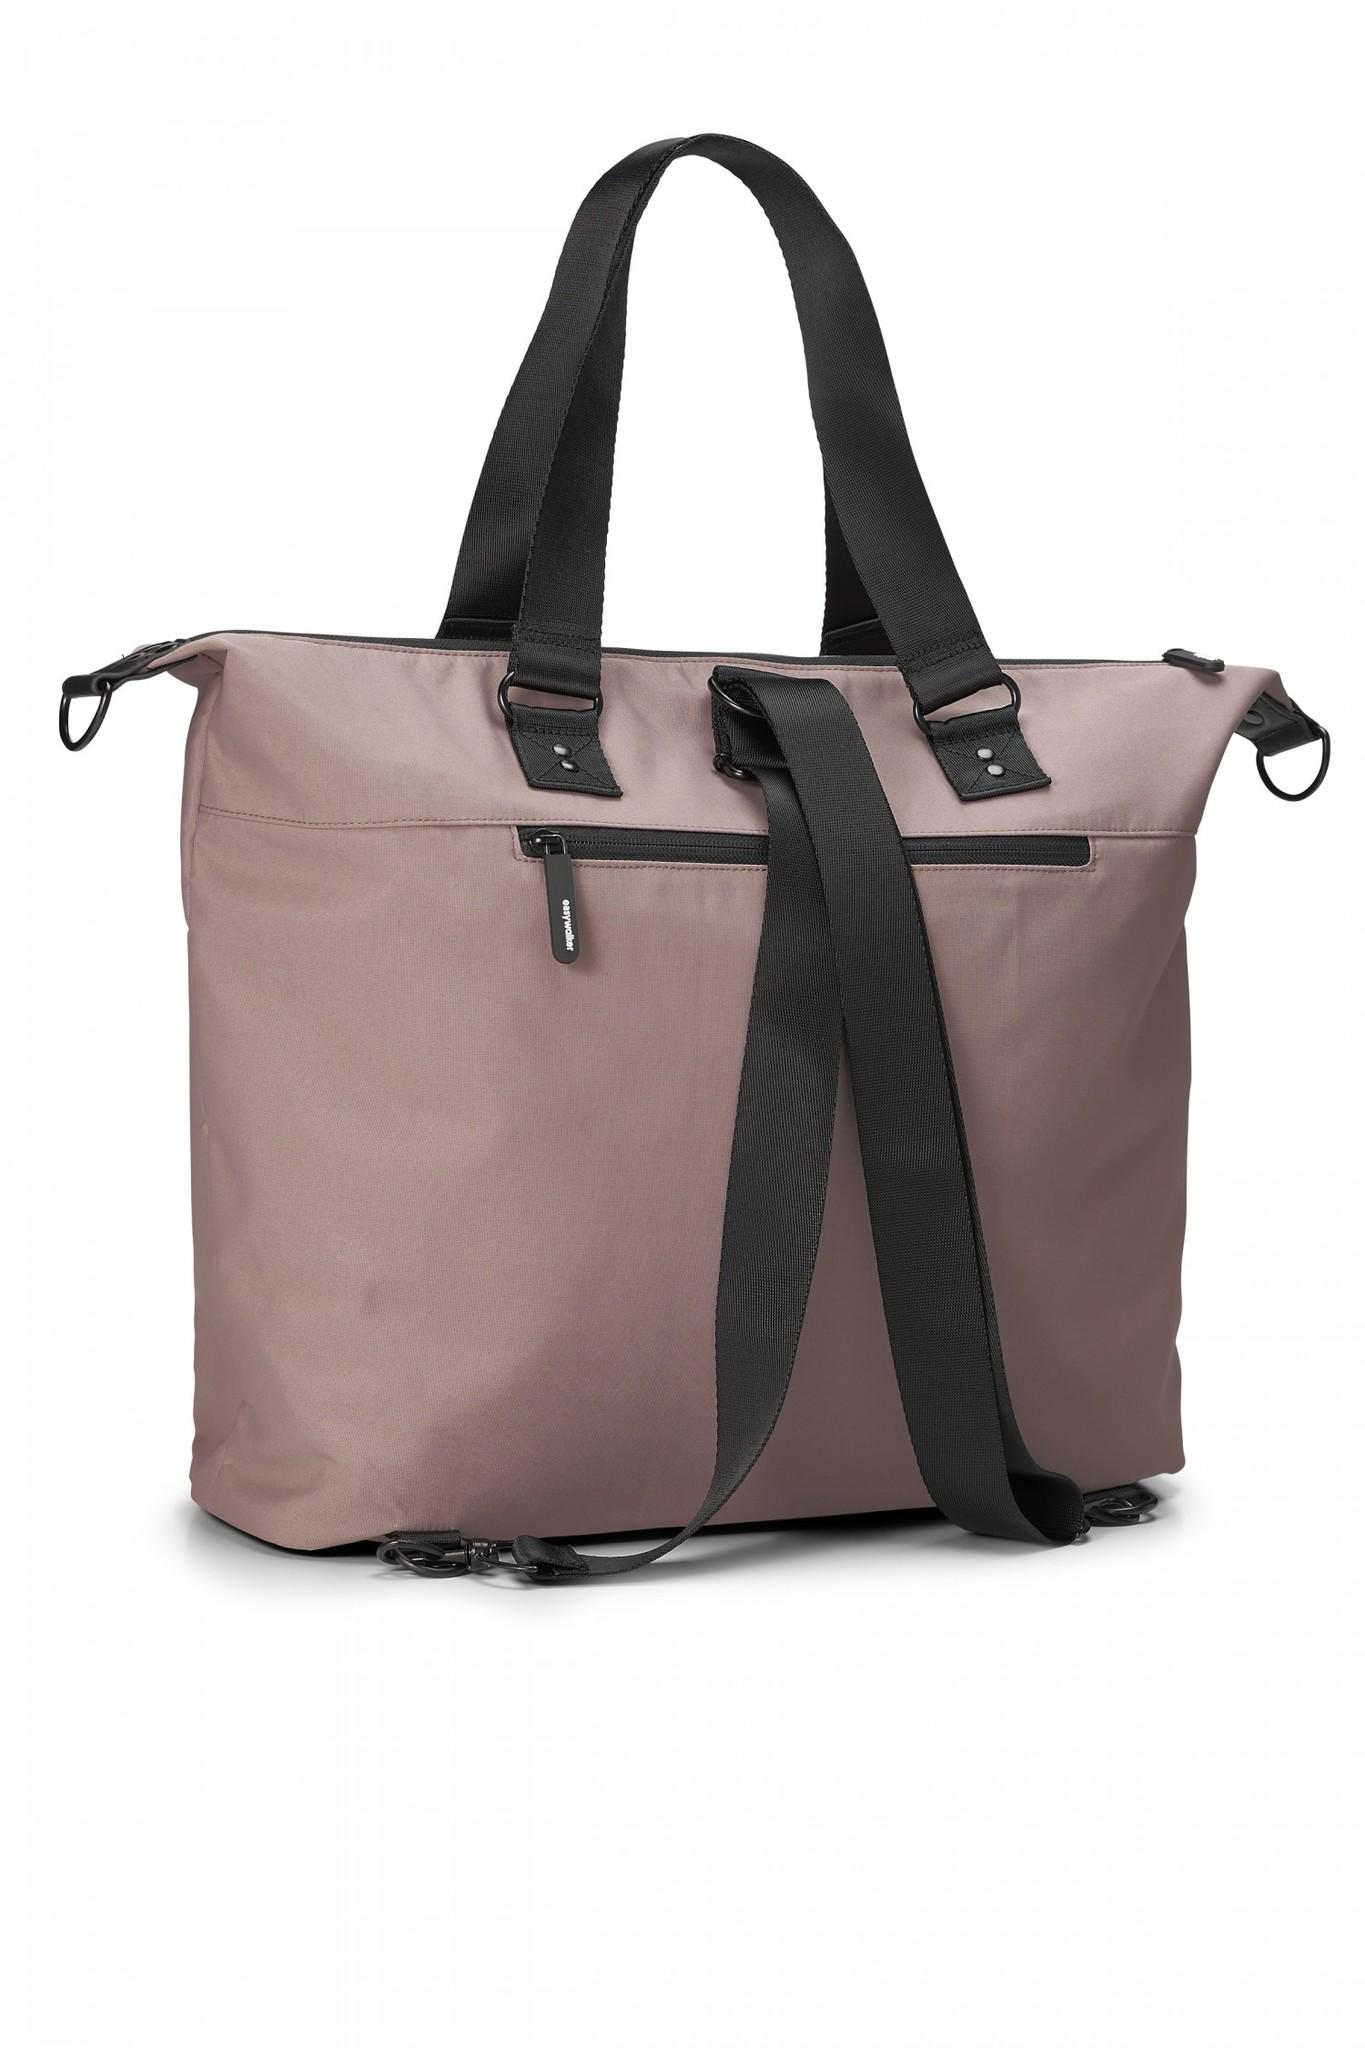 Easywalker Easywalker Kindertasche / Kindertasche Desert Pink